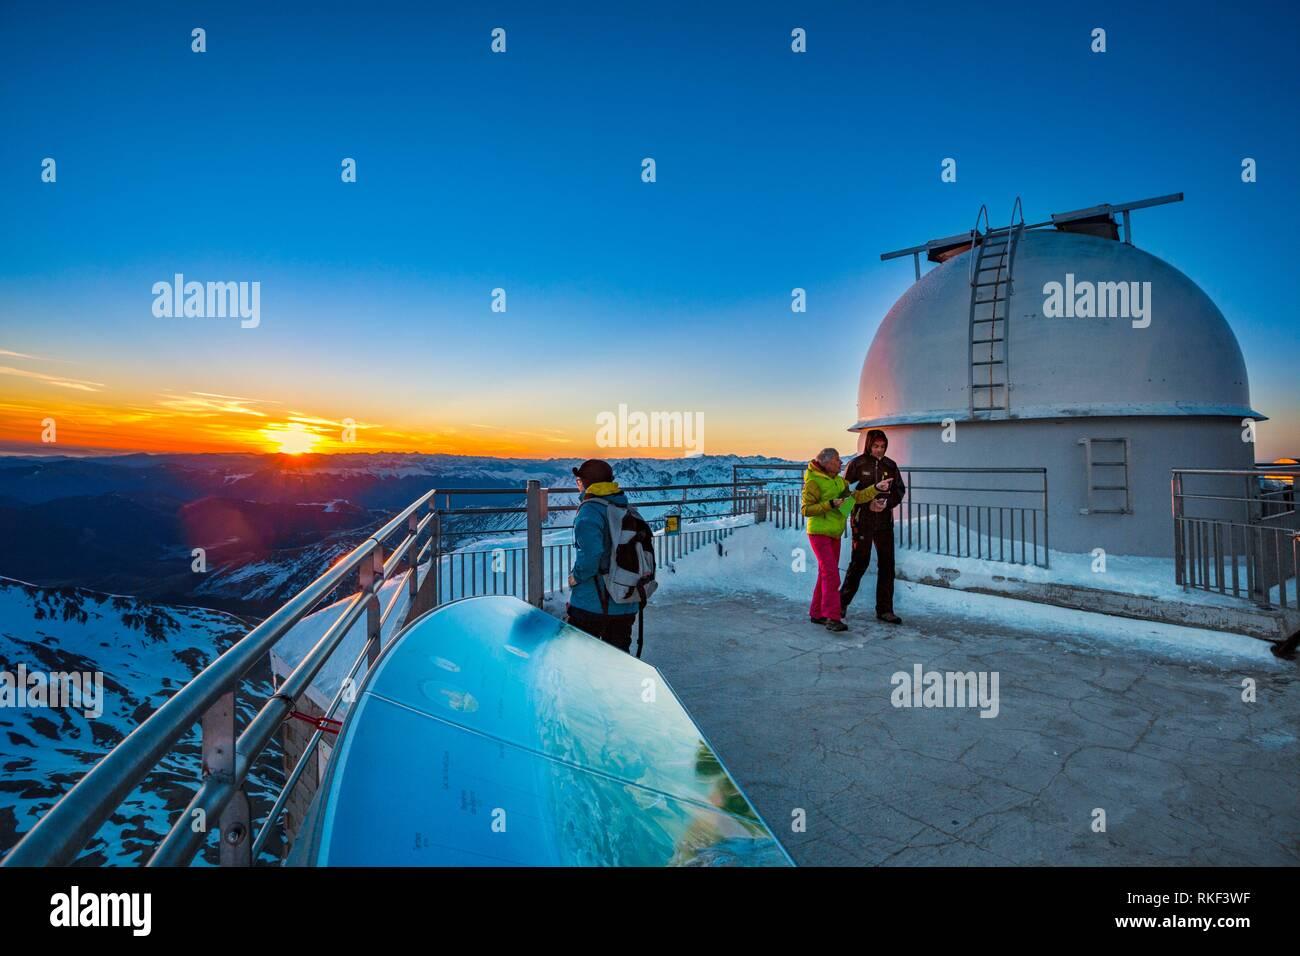 Pic du Midi de Bigorre. Pic du Midi observatory. Luz-Saint Sauveur. Hautes-Pyrenees Department. Midi-Pyrenees Region. France. - Stock Image